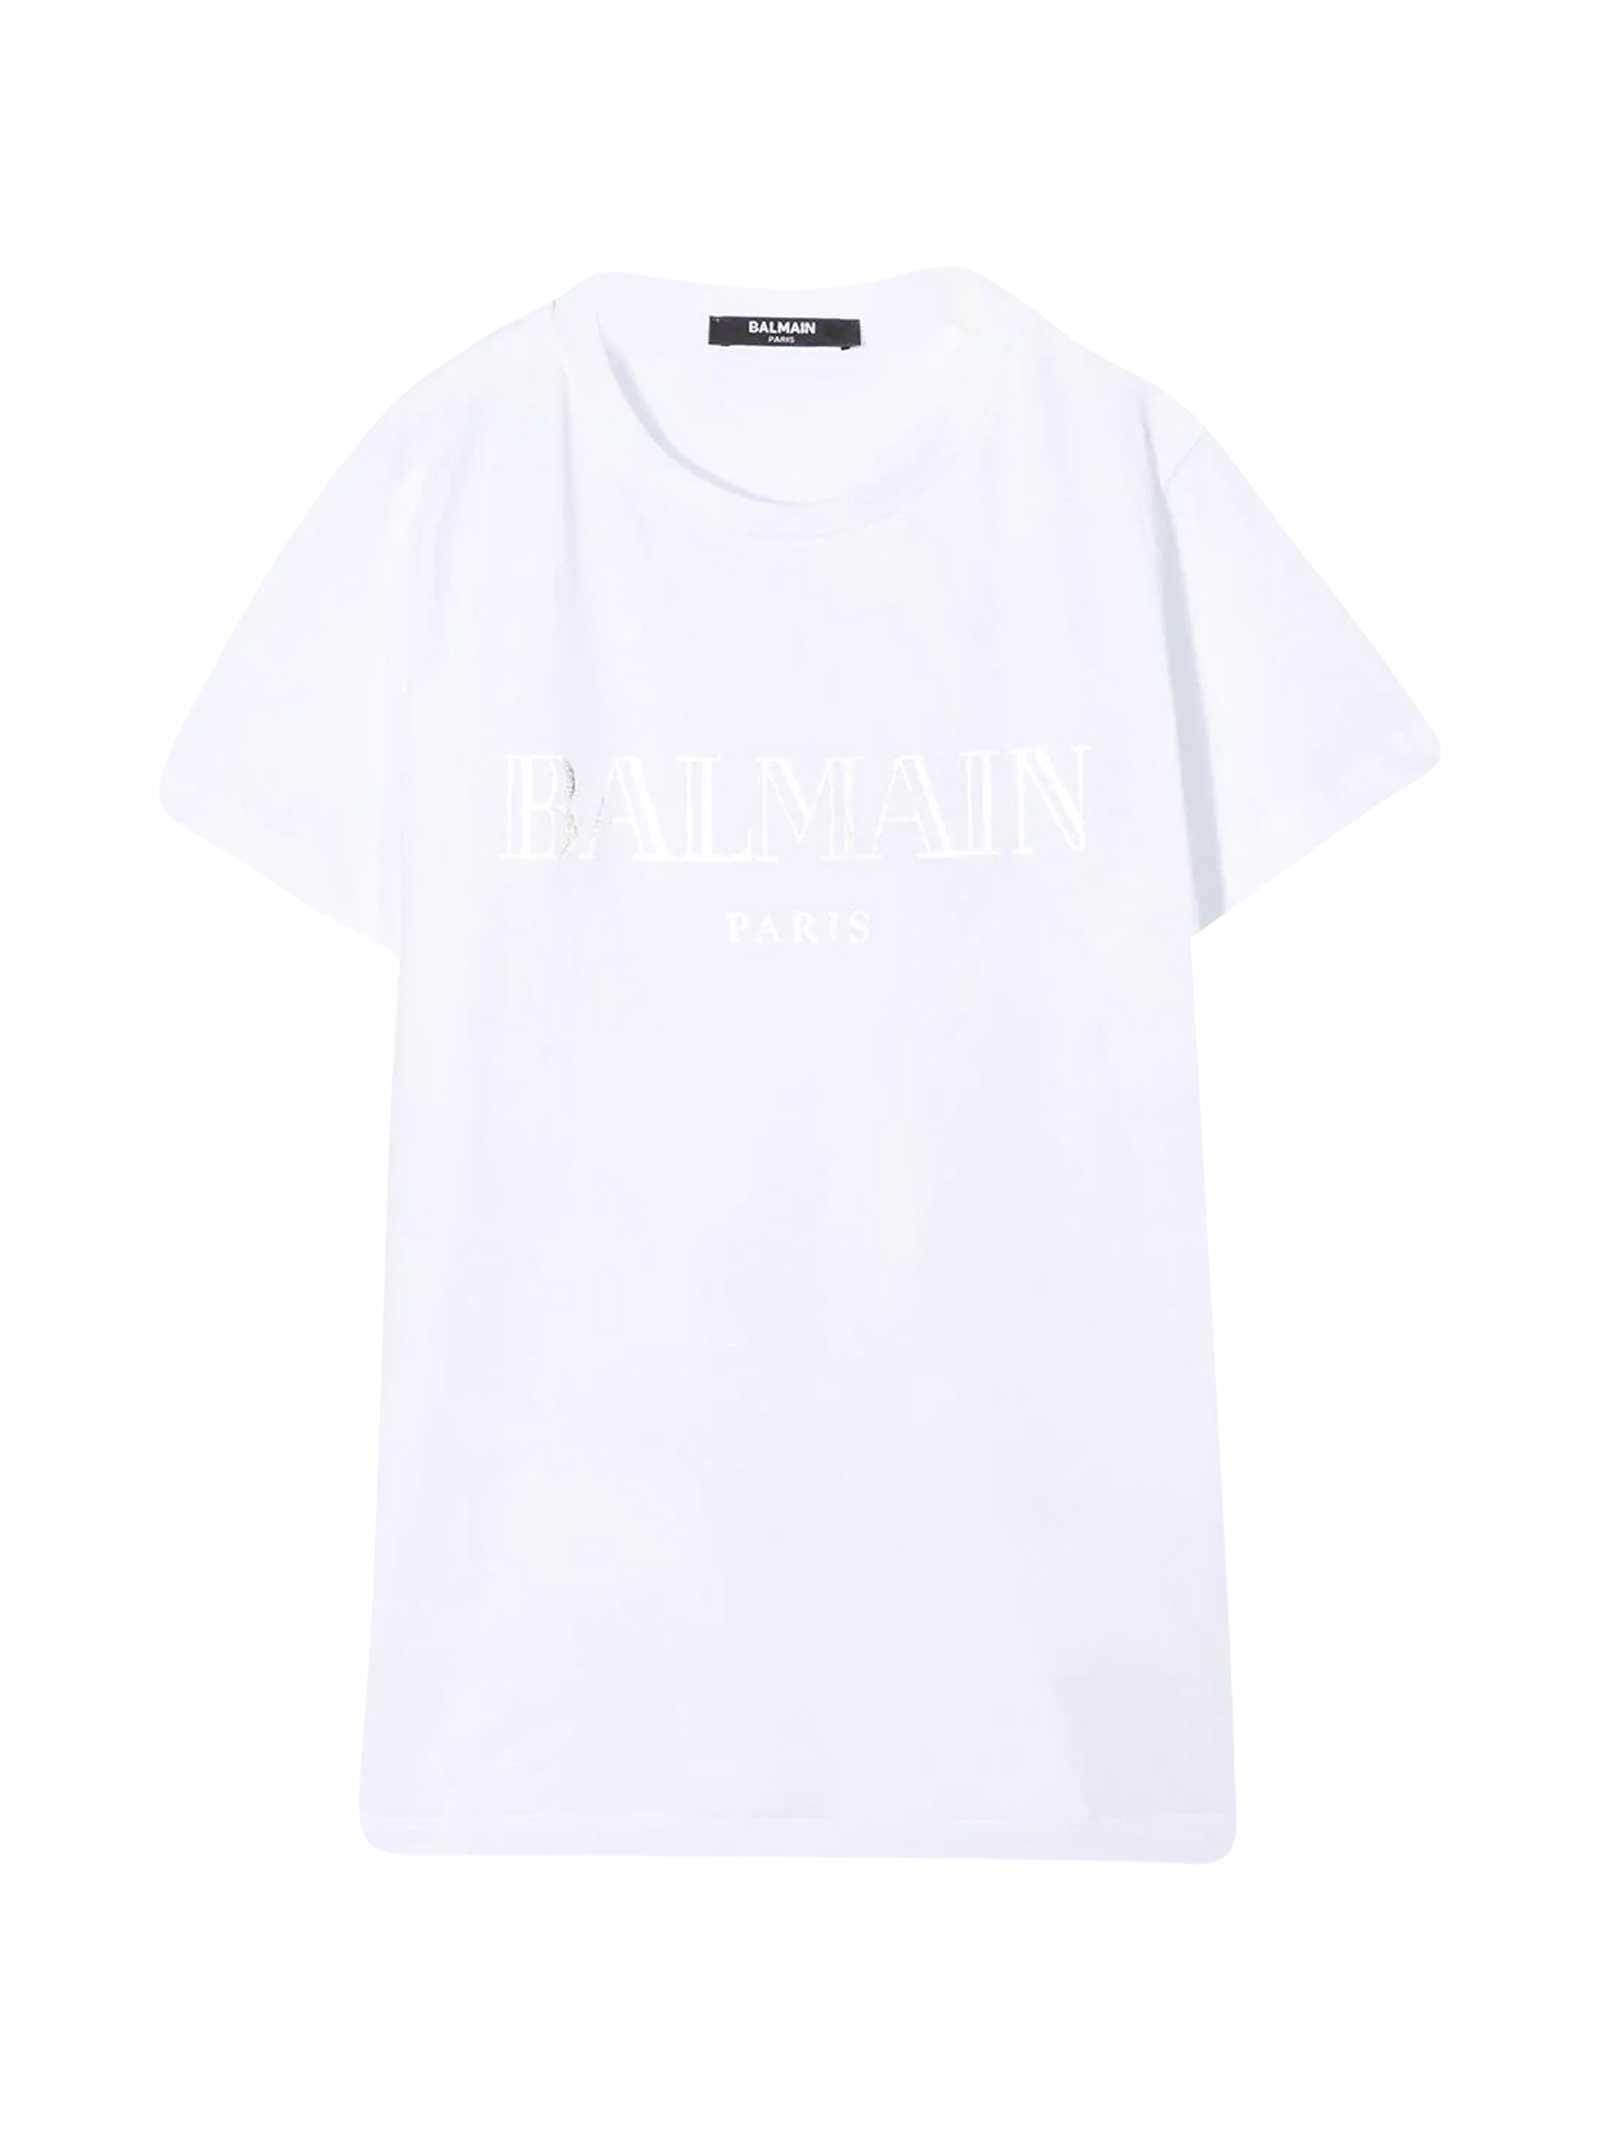 T-shirt bianca teen con logo frontale Balmain kids BALMAIN KIDS | 8 | 6N8551NX290100AGT